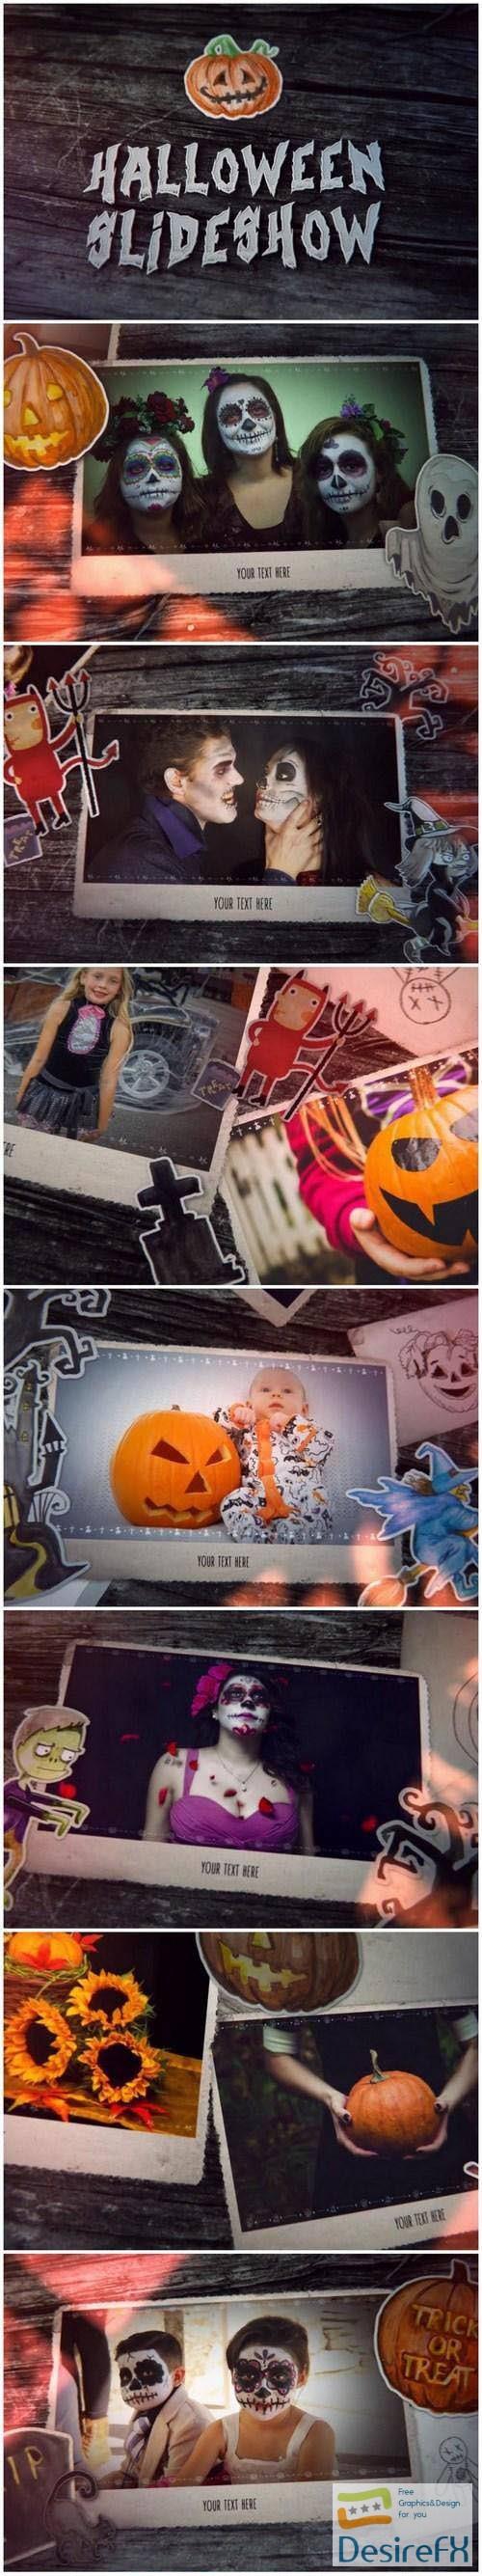 Videohive Halloween Slideshow